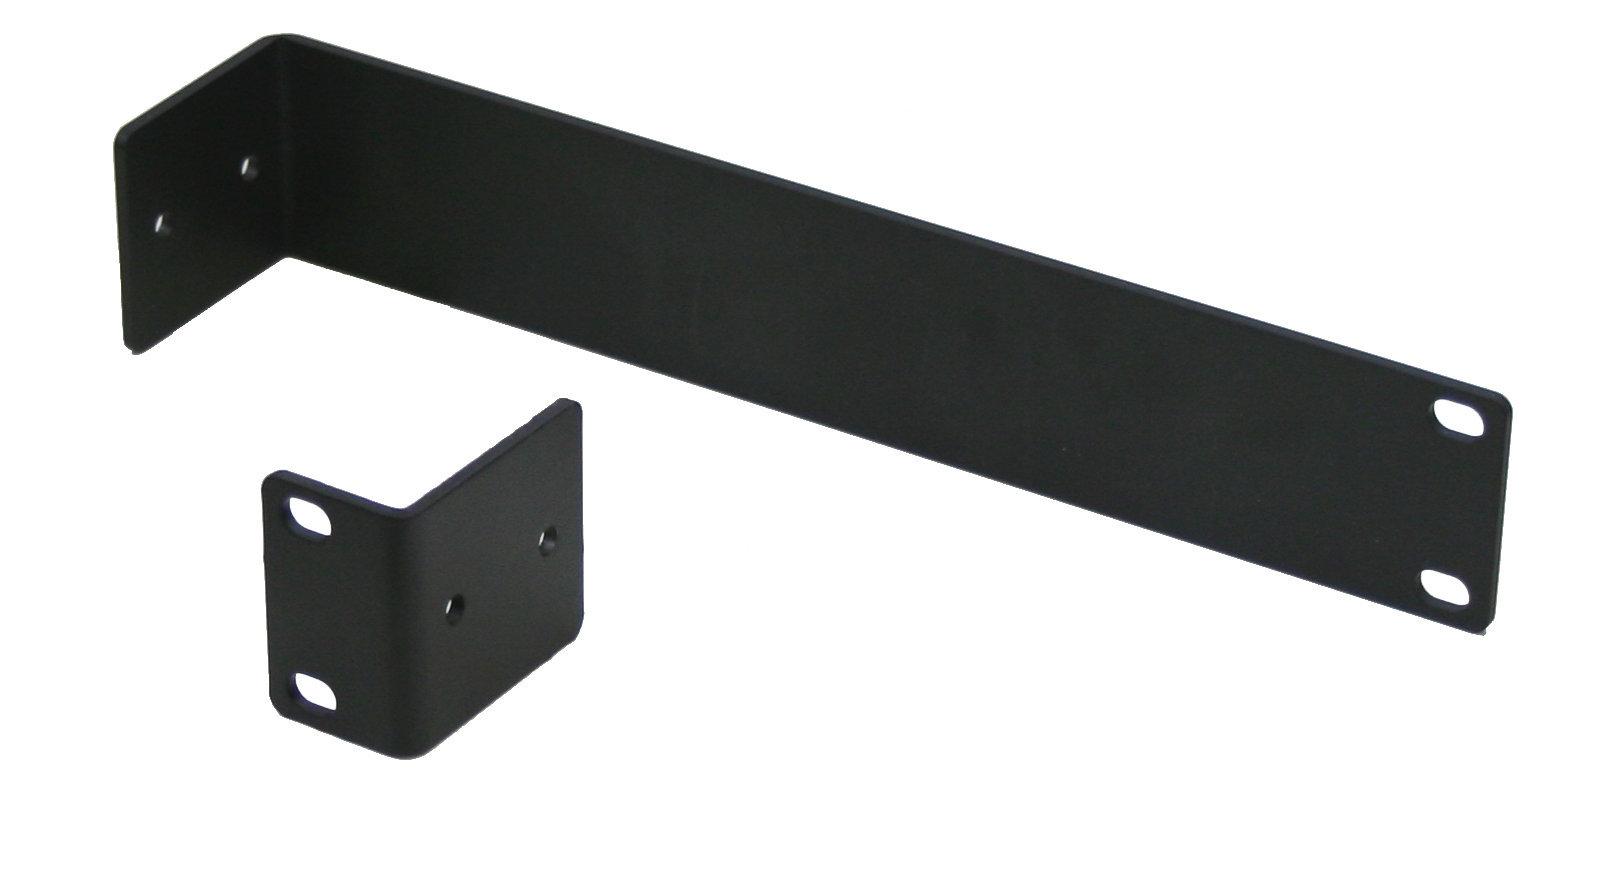 Vaddio 998-6000-004 1/2 Rack Mounting Kit For EasyUSB Mixer/Amp or WEBBi